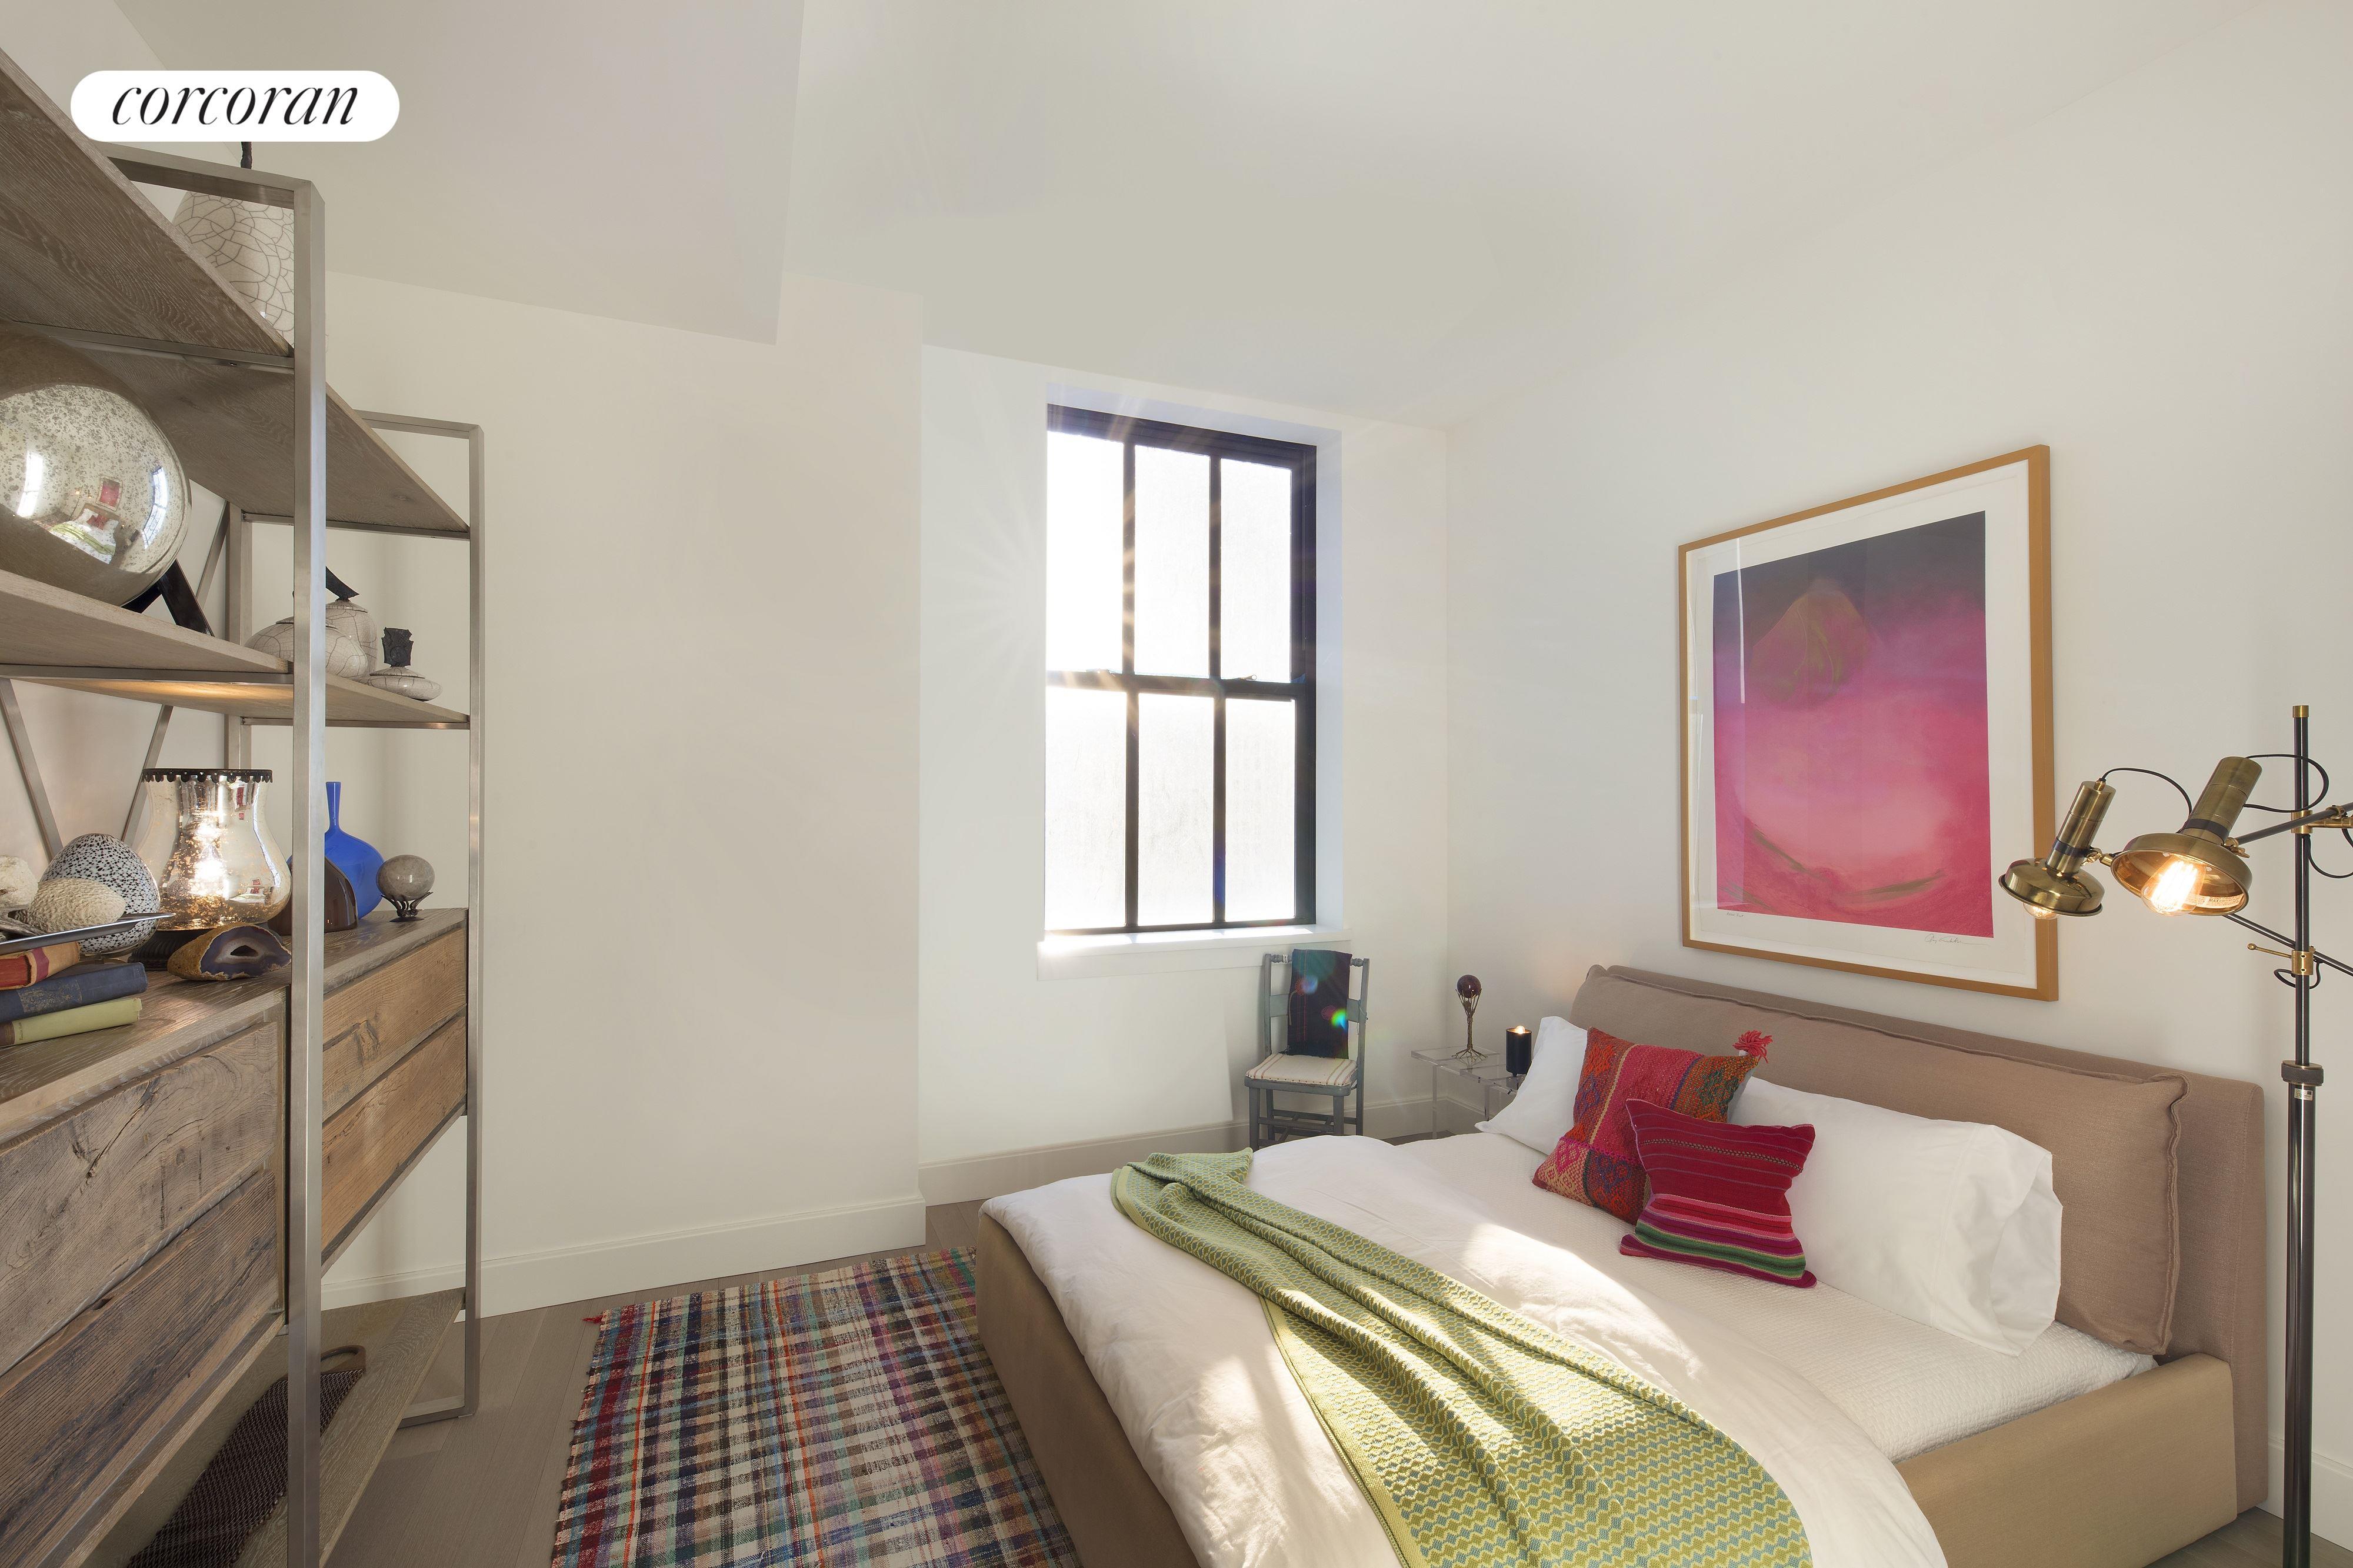 Corcoran, 100 BARCLAY ST, Apt. 12N, Tribeca Real Estate, Manhattan ...